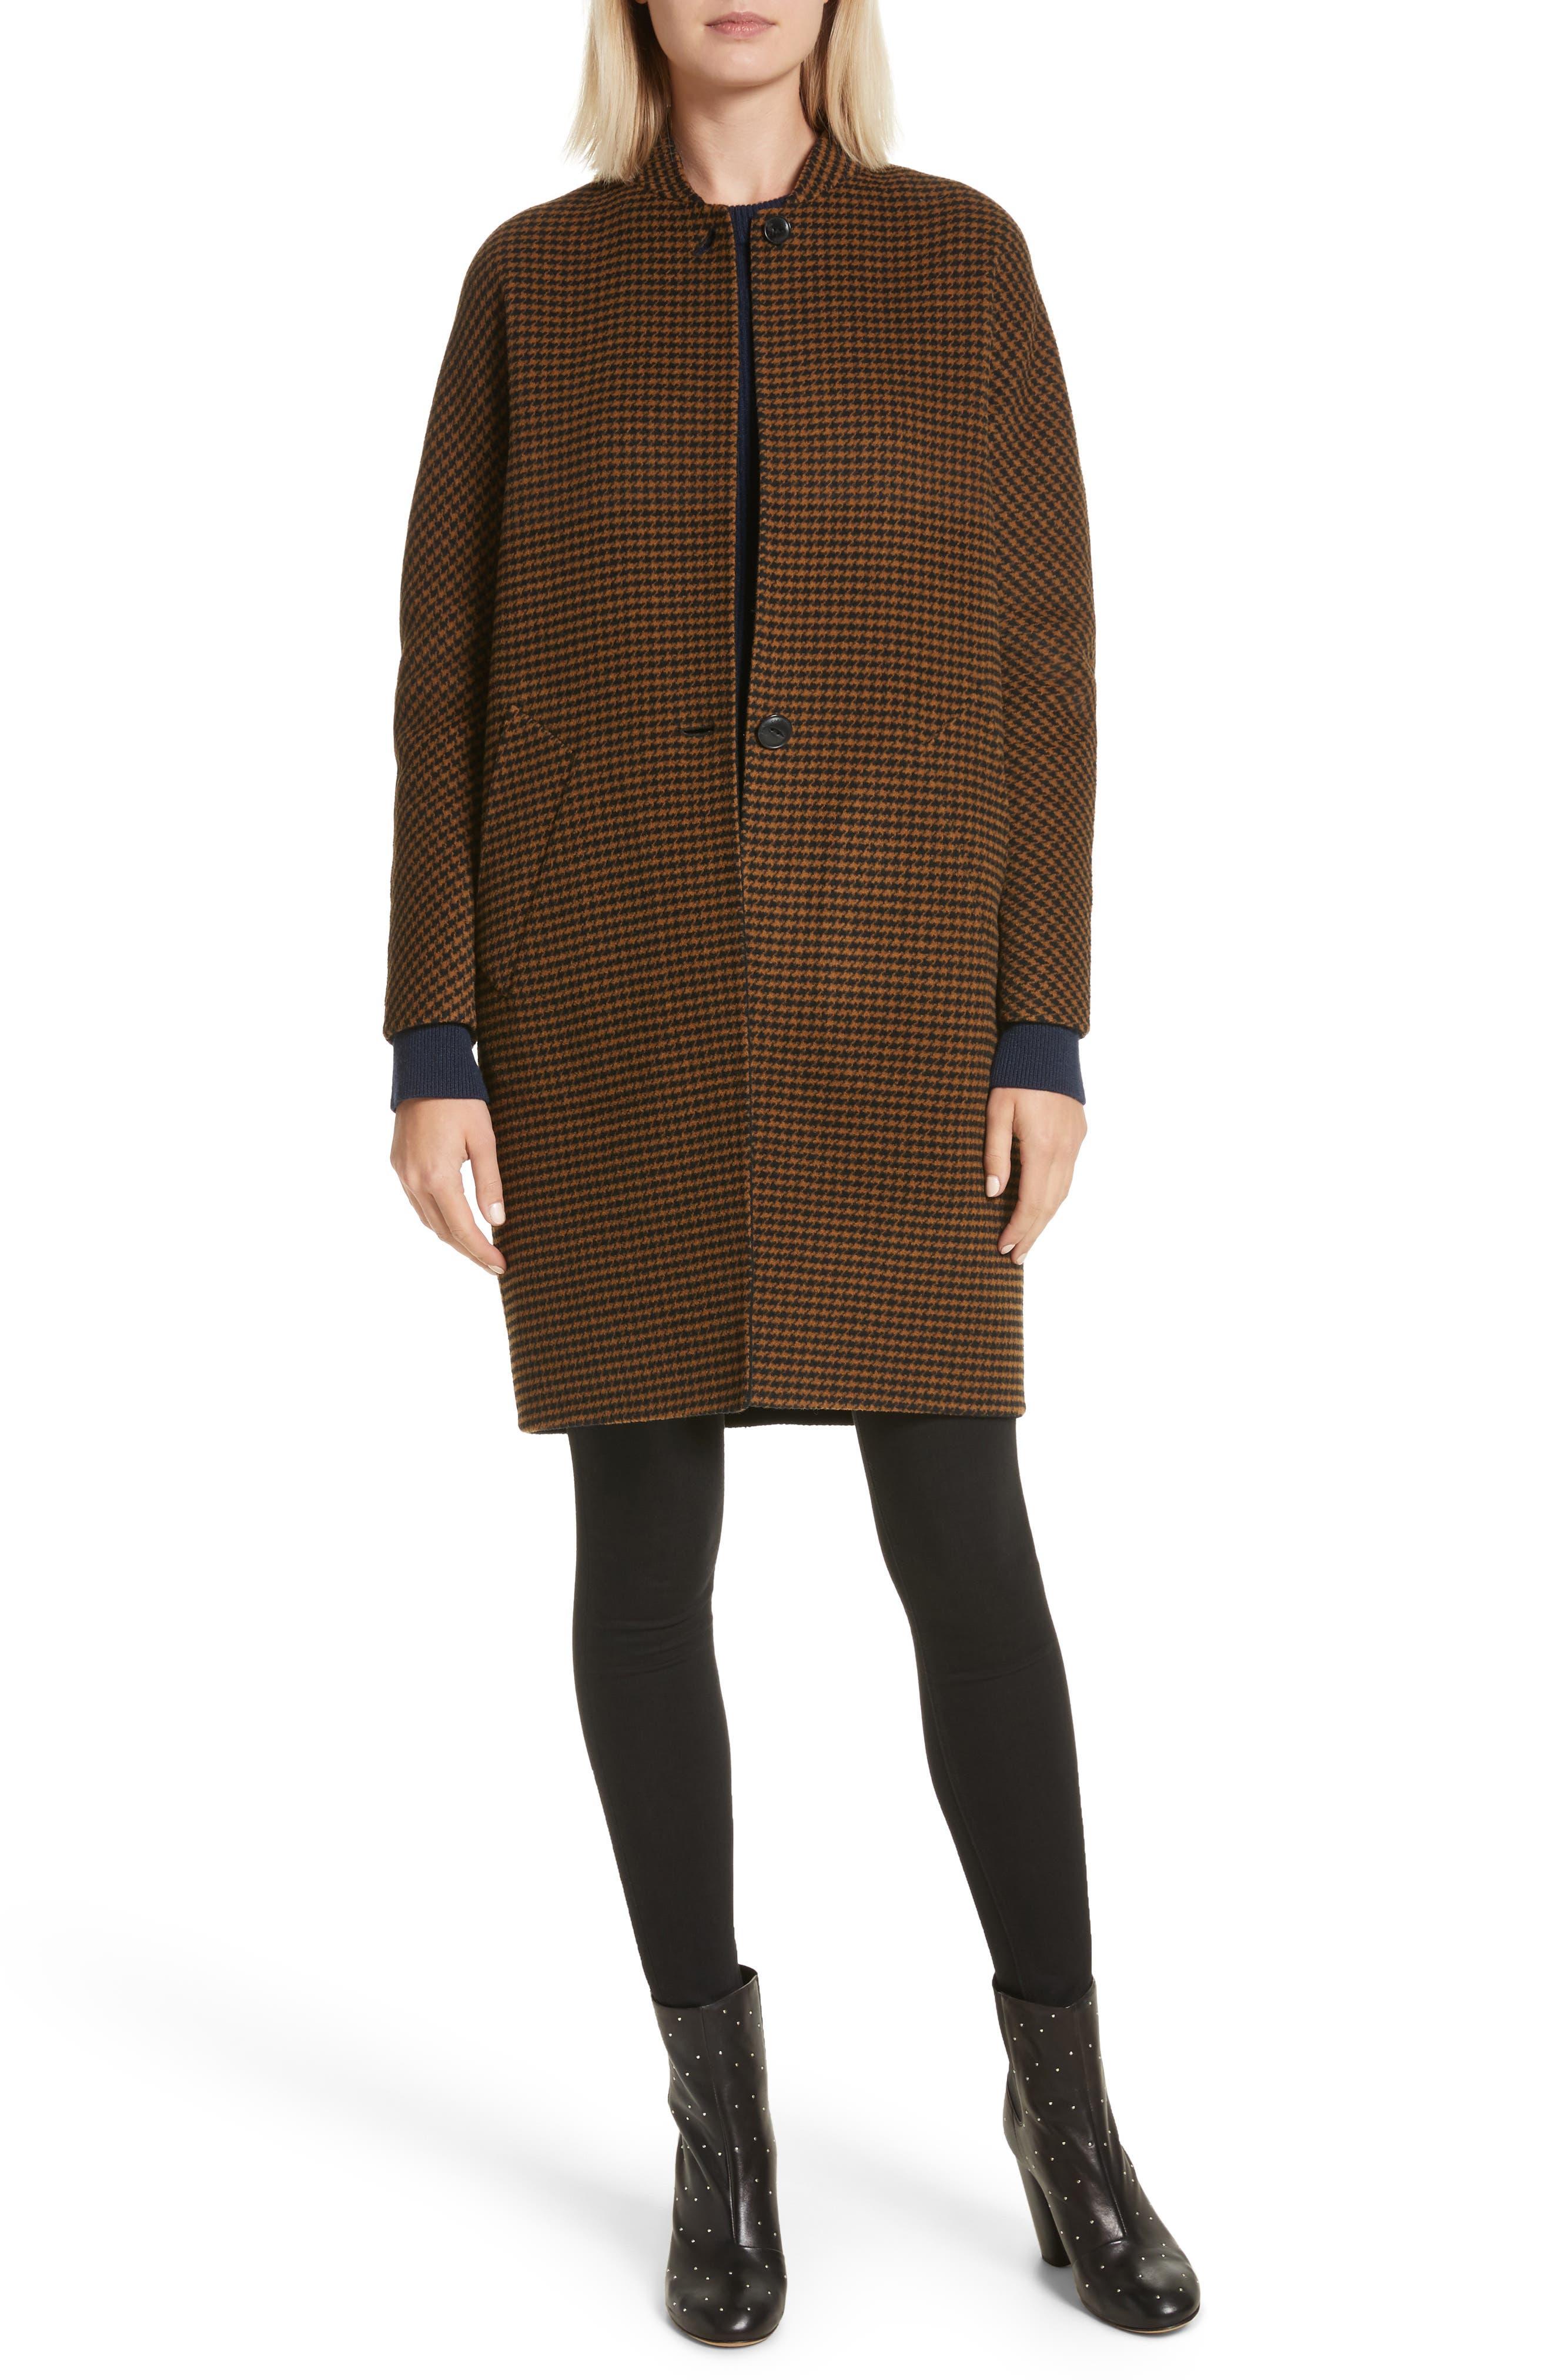 Darwen Reversible Wool & Cashmere Coat,                             Alternate thumbnail 2, color,                             Brown/Black